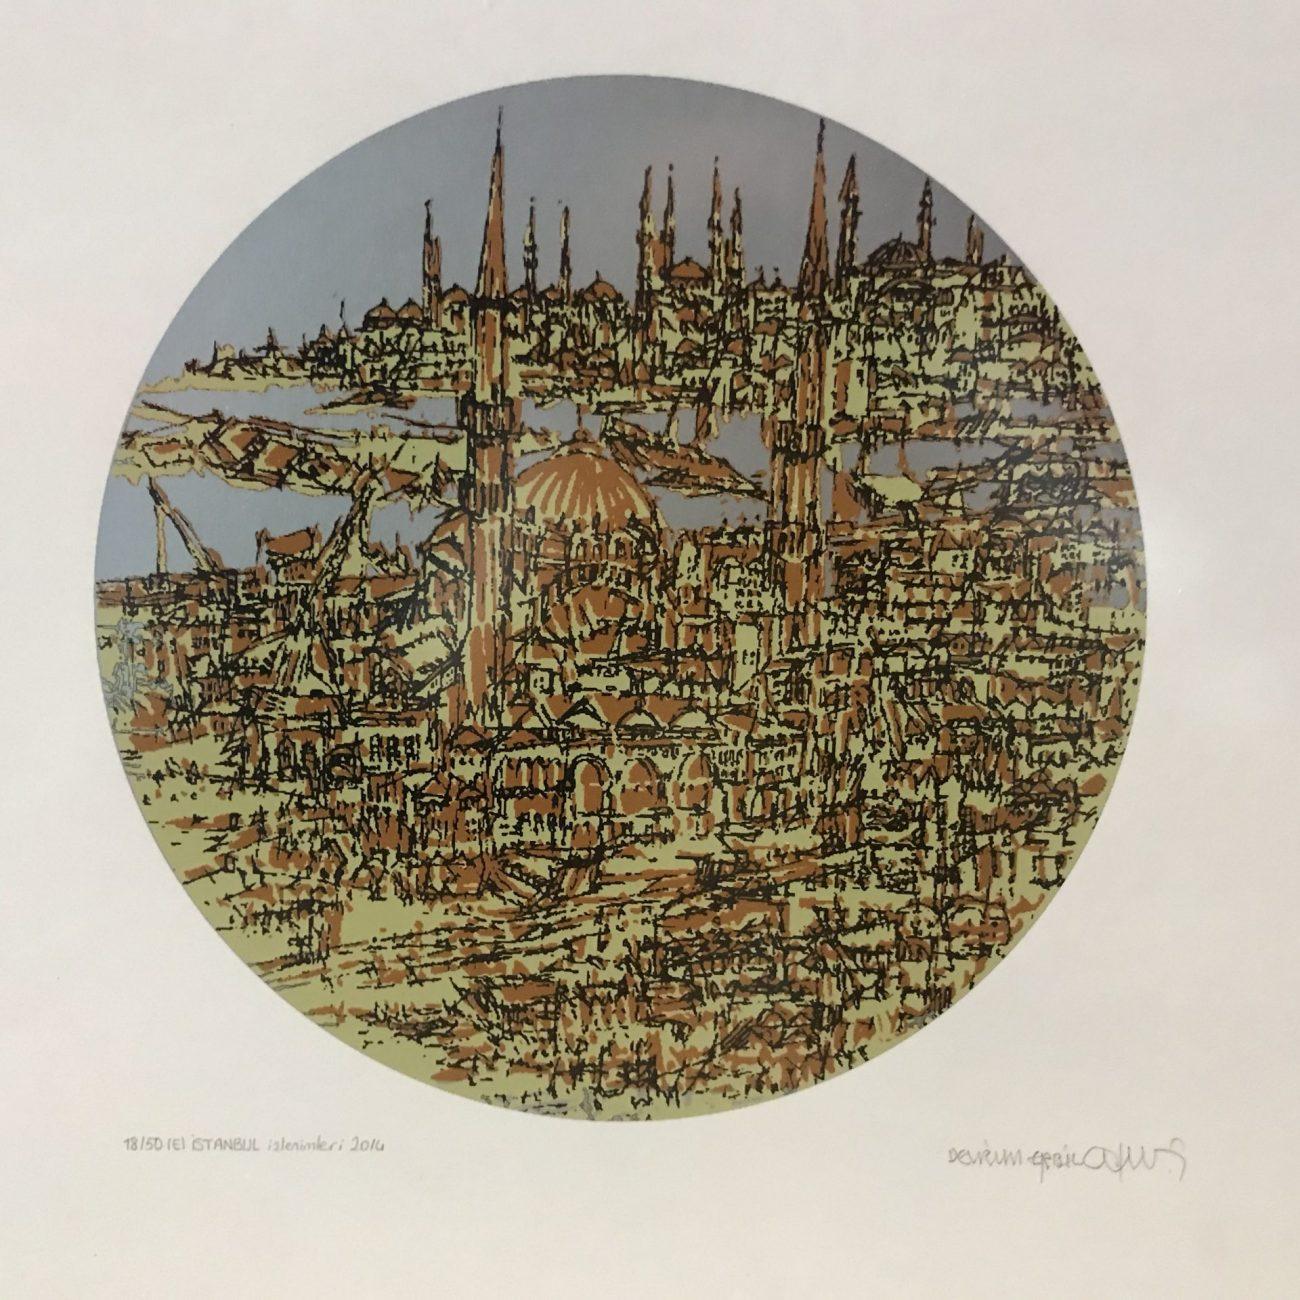 Devrim Erbil Teknik: Özgün Baskı  Ölçü: 28 x 28 cm  Fiyat : 3.540 TL